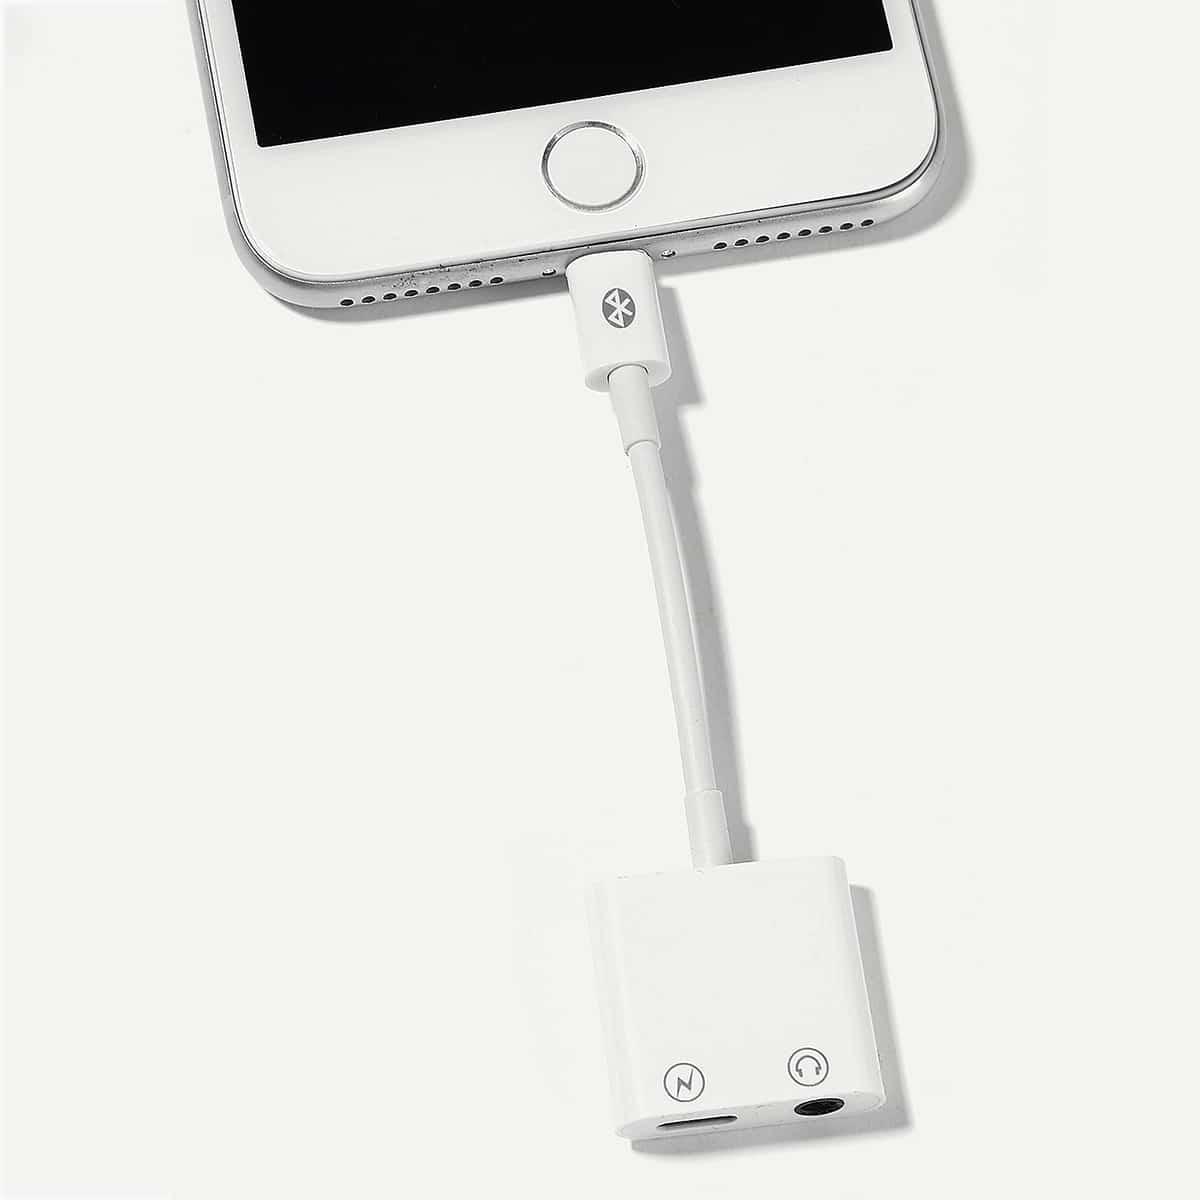 iPhone Audio-oplaadadapter